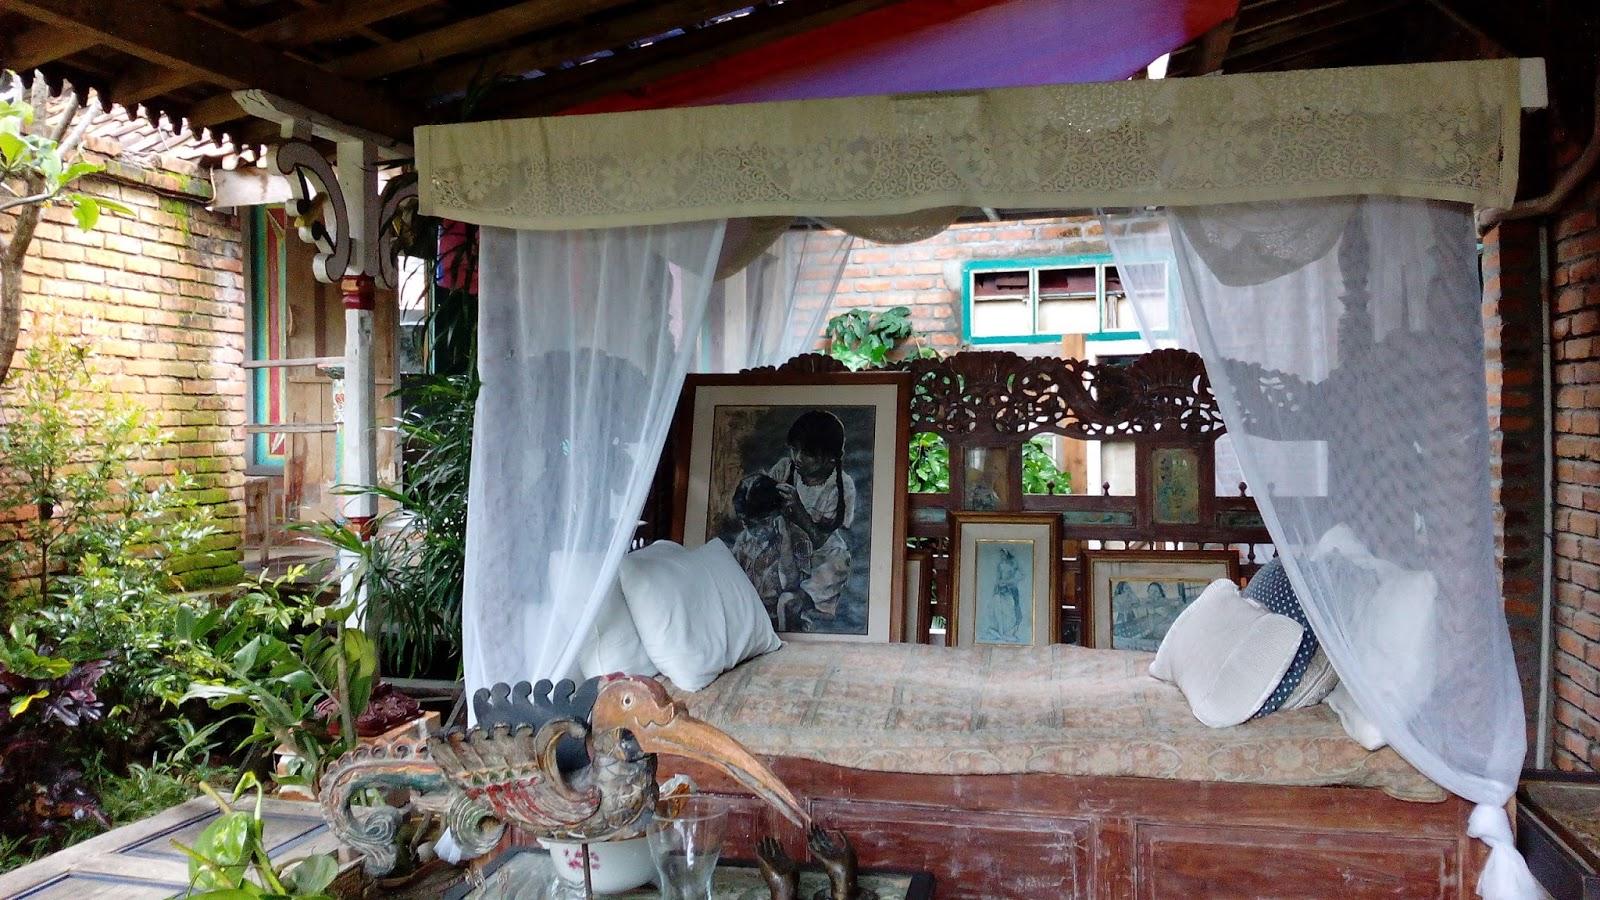 04 01 2018 05 Jelajah Kalimantan House Of Julia Bantal Tidur Asli Gazebo Dan Kursi Malas Yang Lengkap Ama